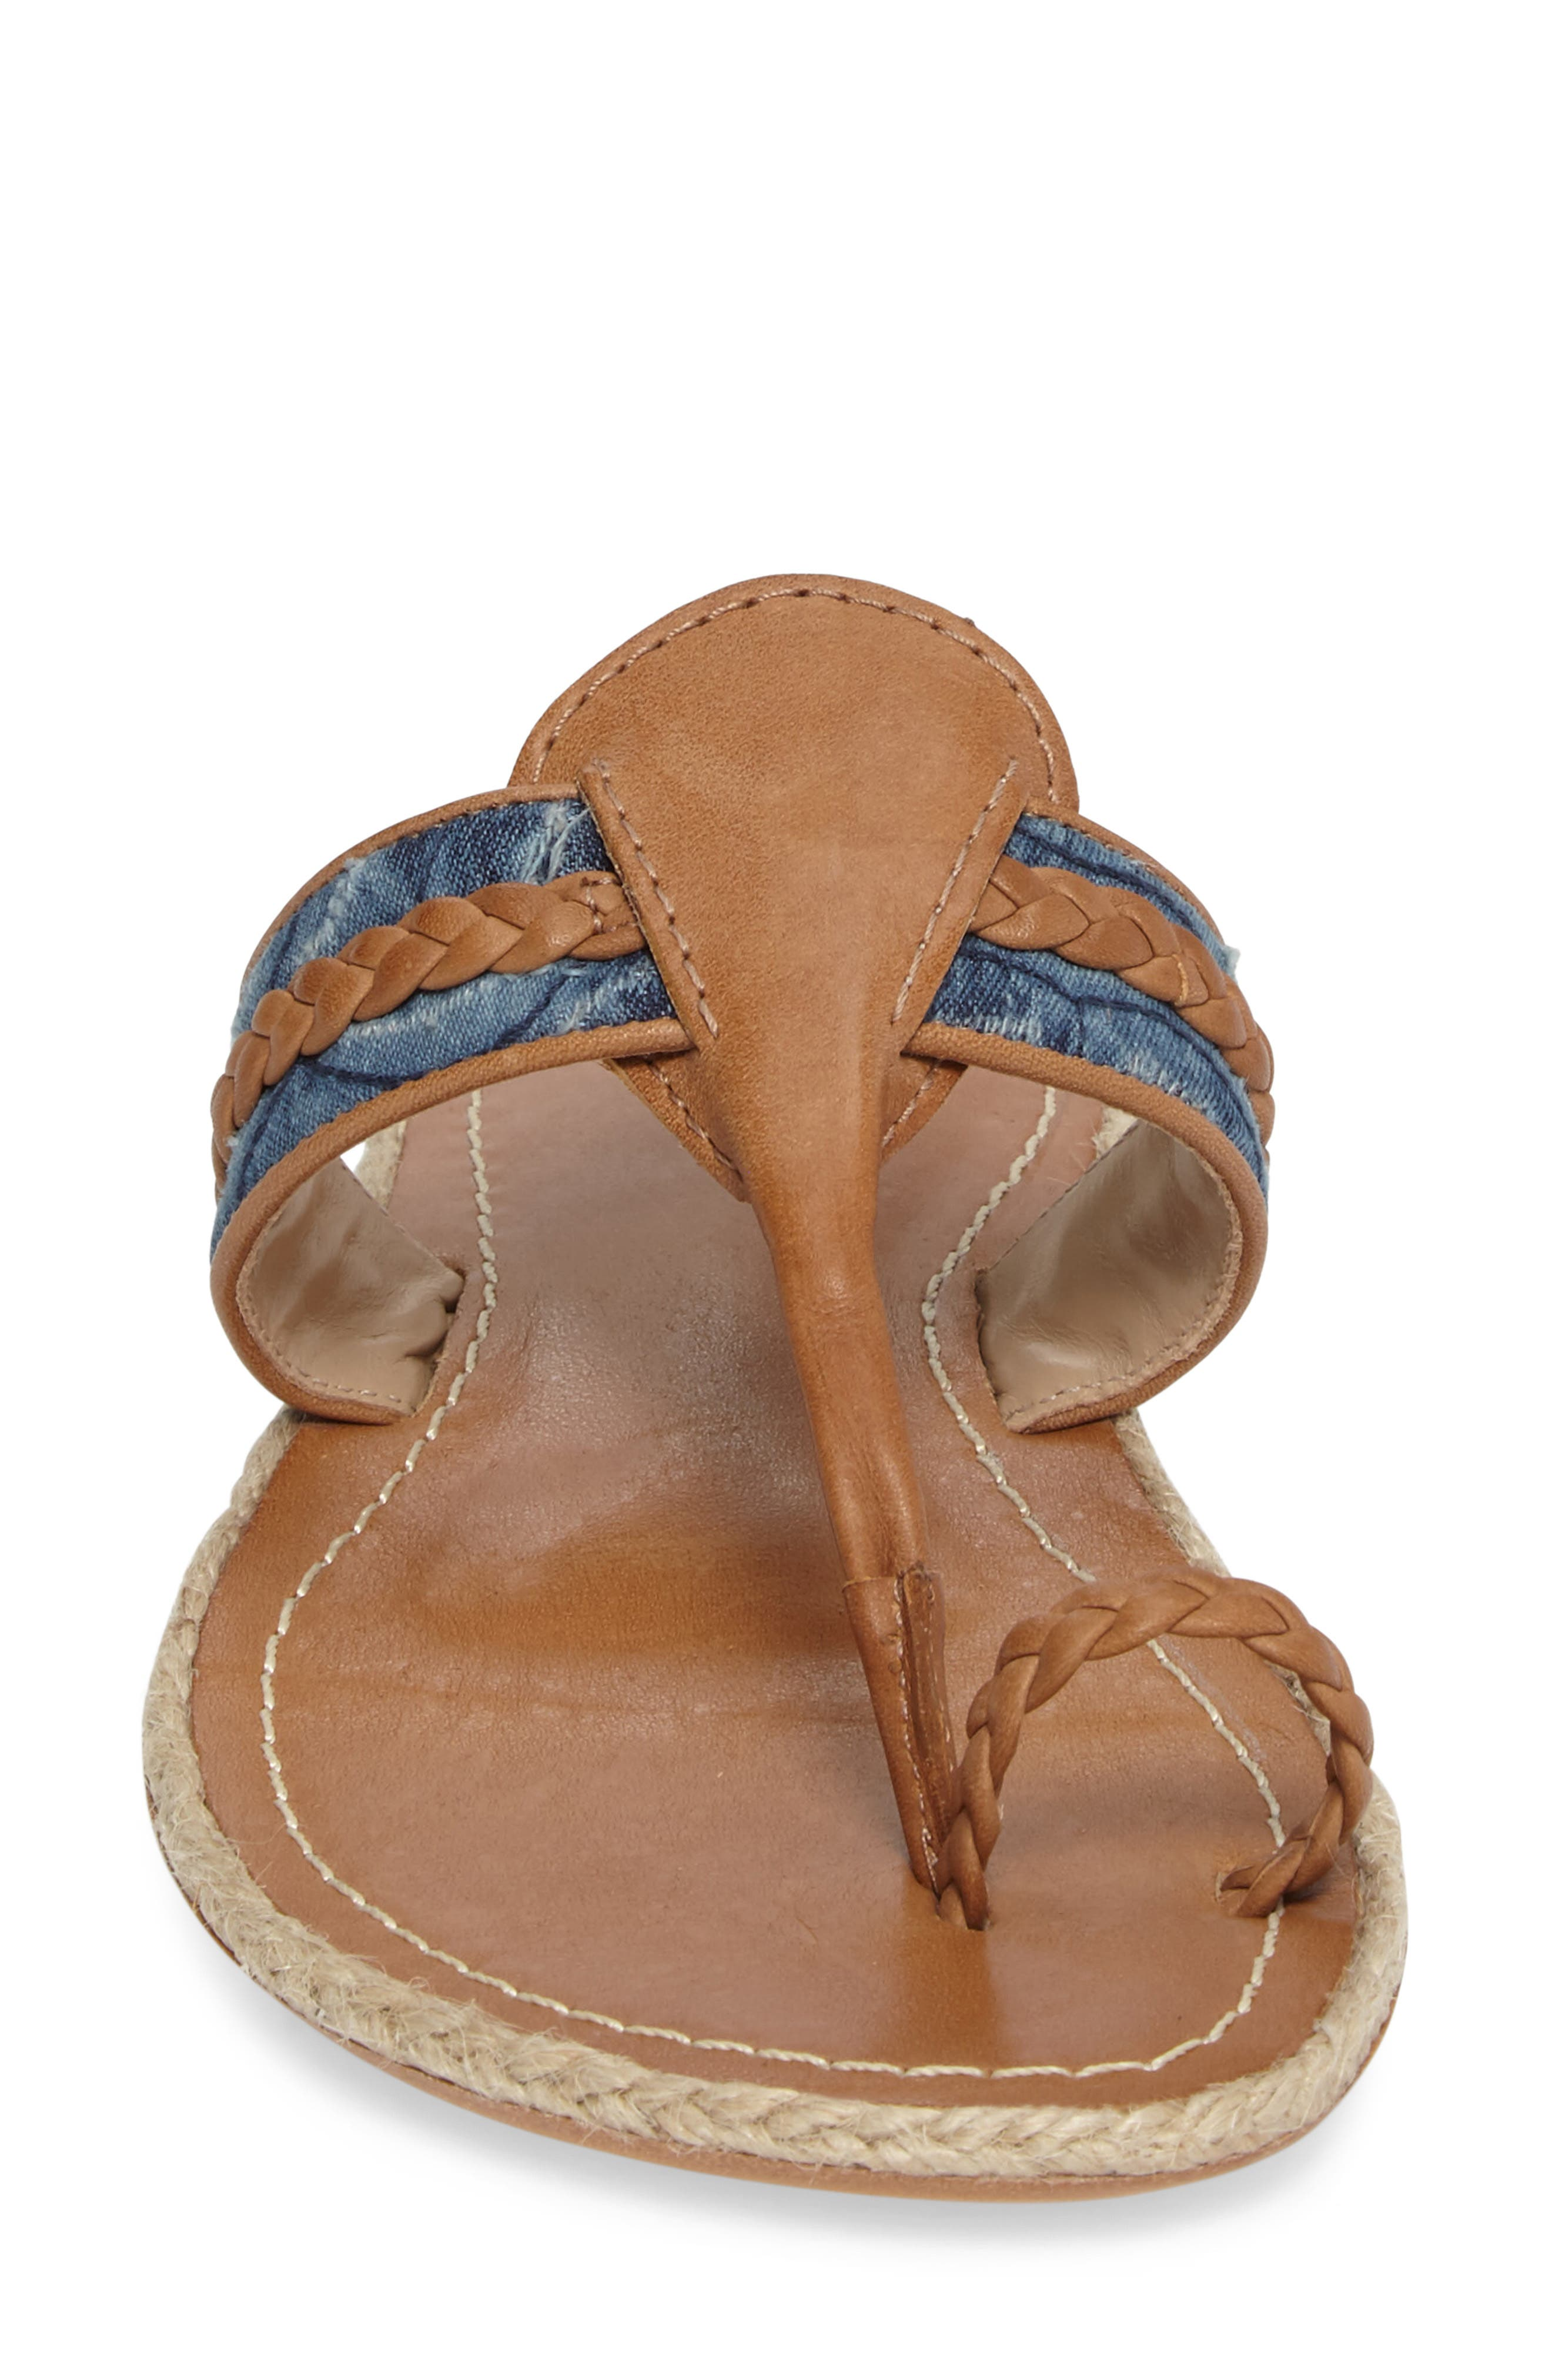 Wendy Sandal,                             Alternate thumbnail 4, color,                             Tan Leather